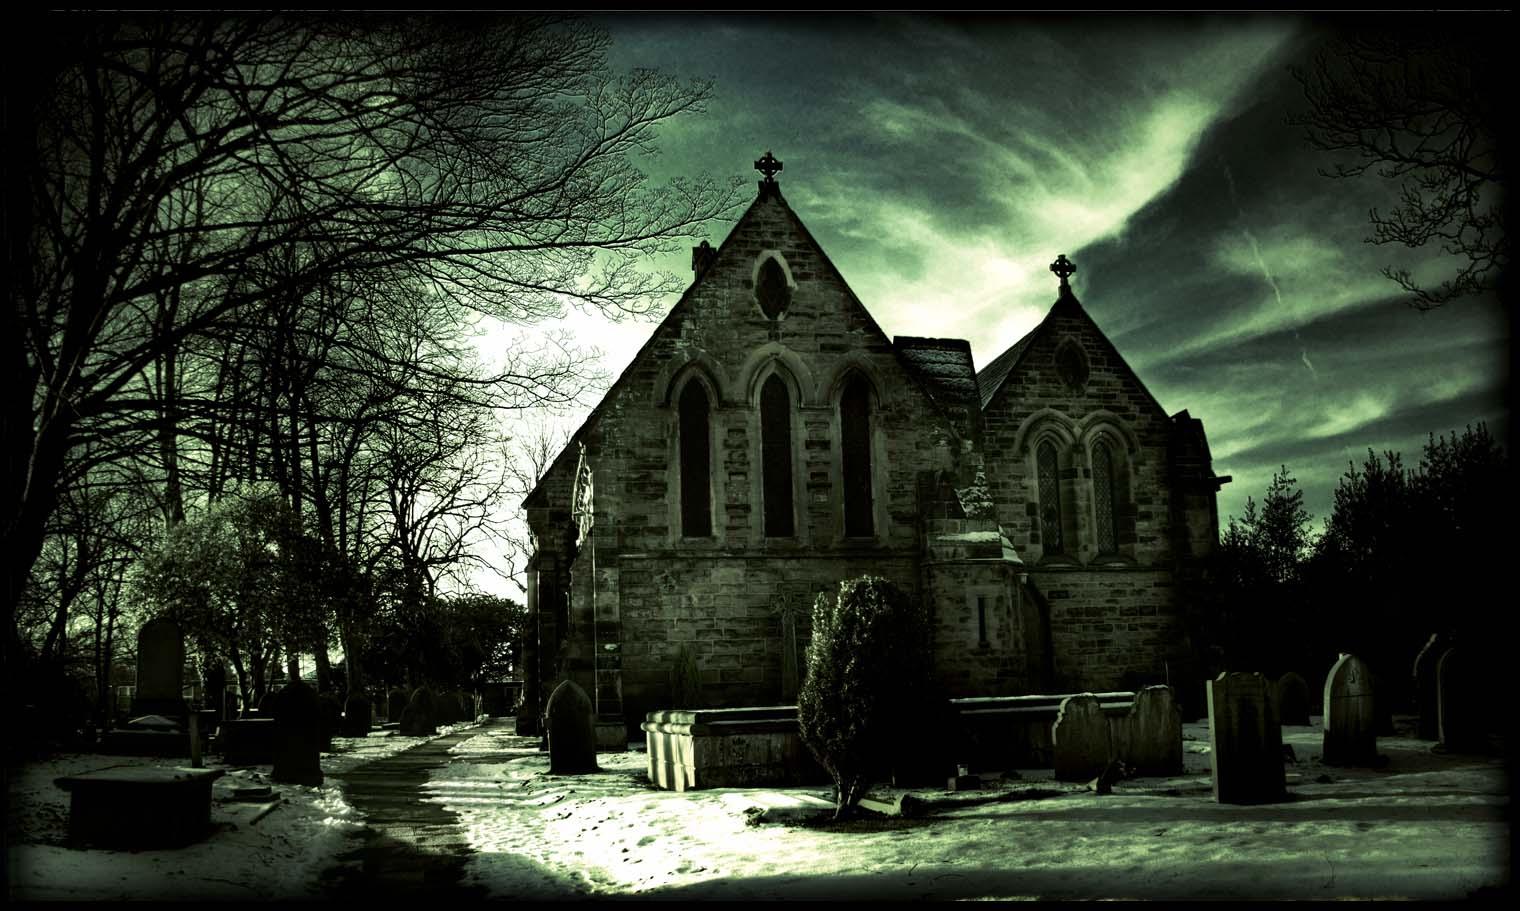 allstaints,all,saint's,church,cheshire,drive,thelwall,cit allstaints,city,tonysmith,tony,smith,hotpix,hotpics,hotpicks,hot,pix,pics,picks,green,emerald,village,please tag 'village' for English villages,ipod,music,#tonysmithhotpix,#tonysmithotpix